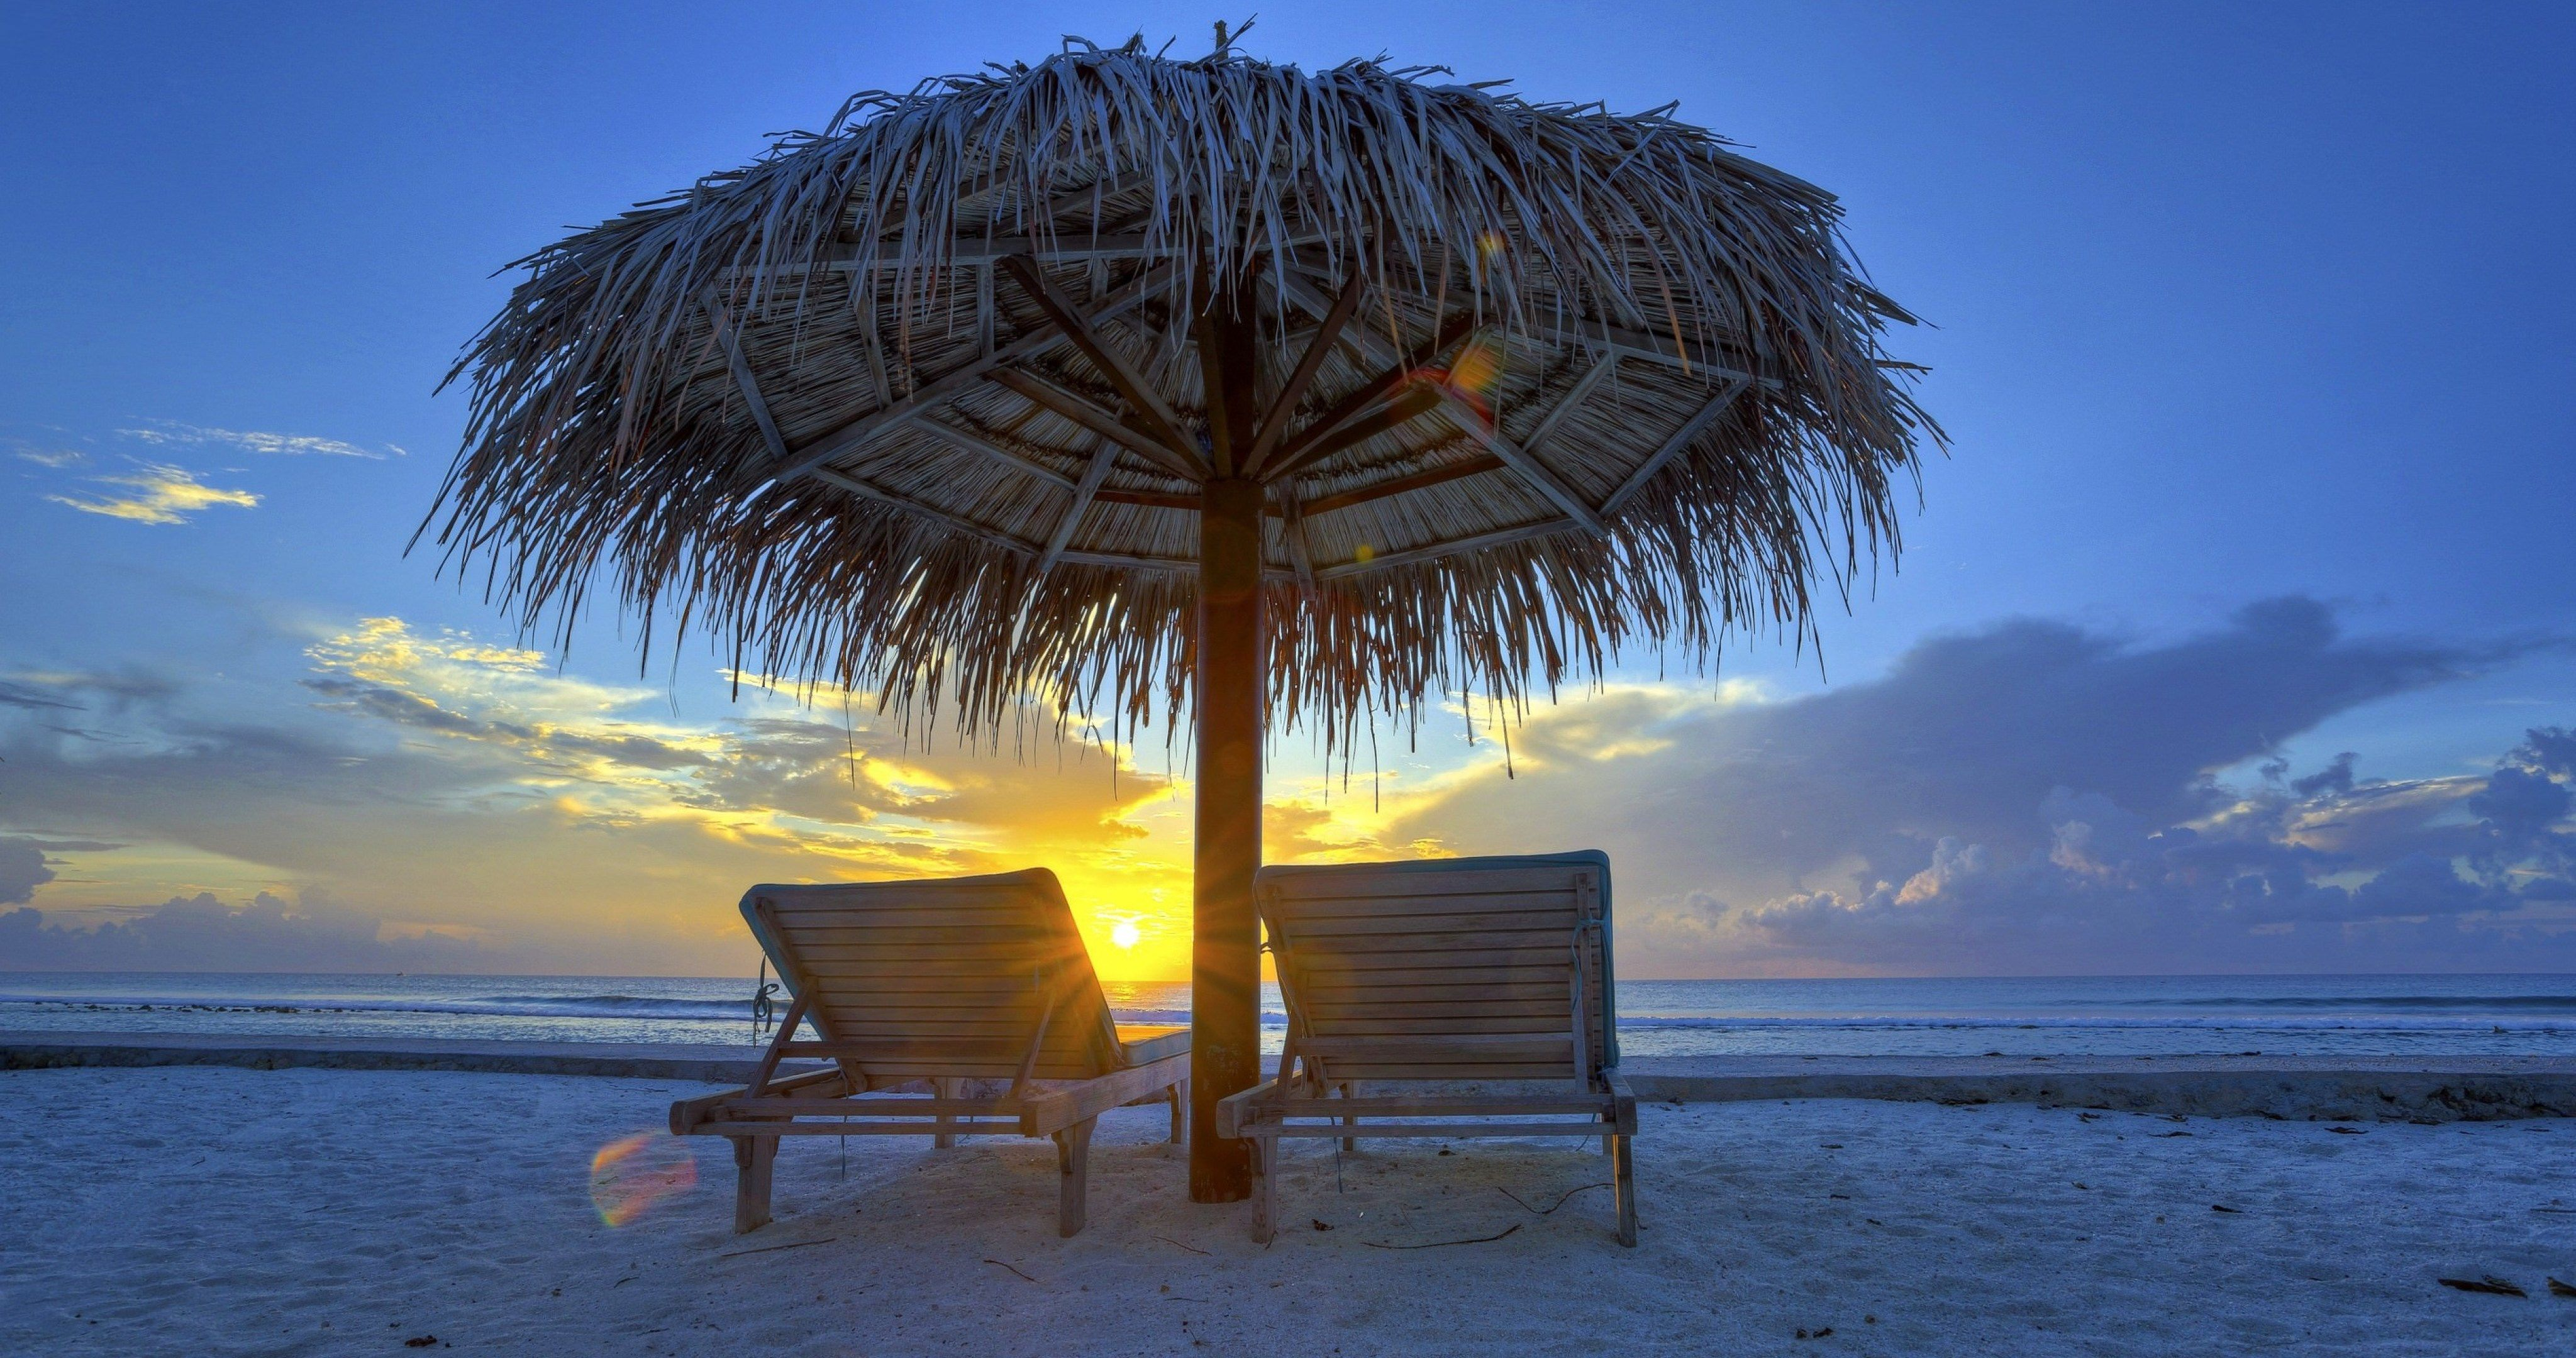 Evening Sky In Maldivies 4k Ultra Hd Wallpaper Evening Sky Maldives Beach Chair Umbrella